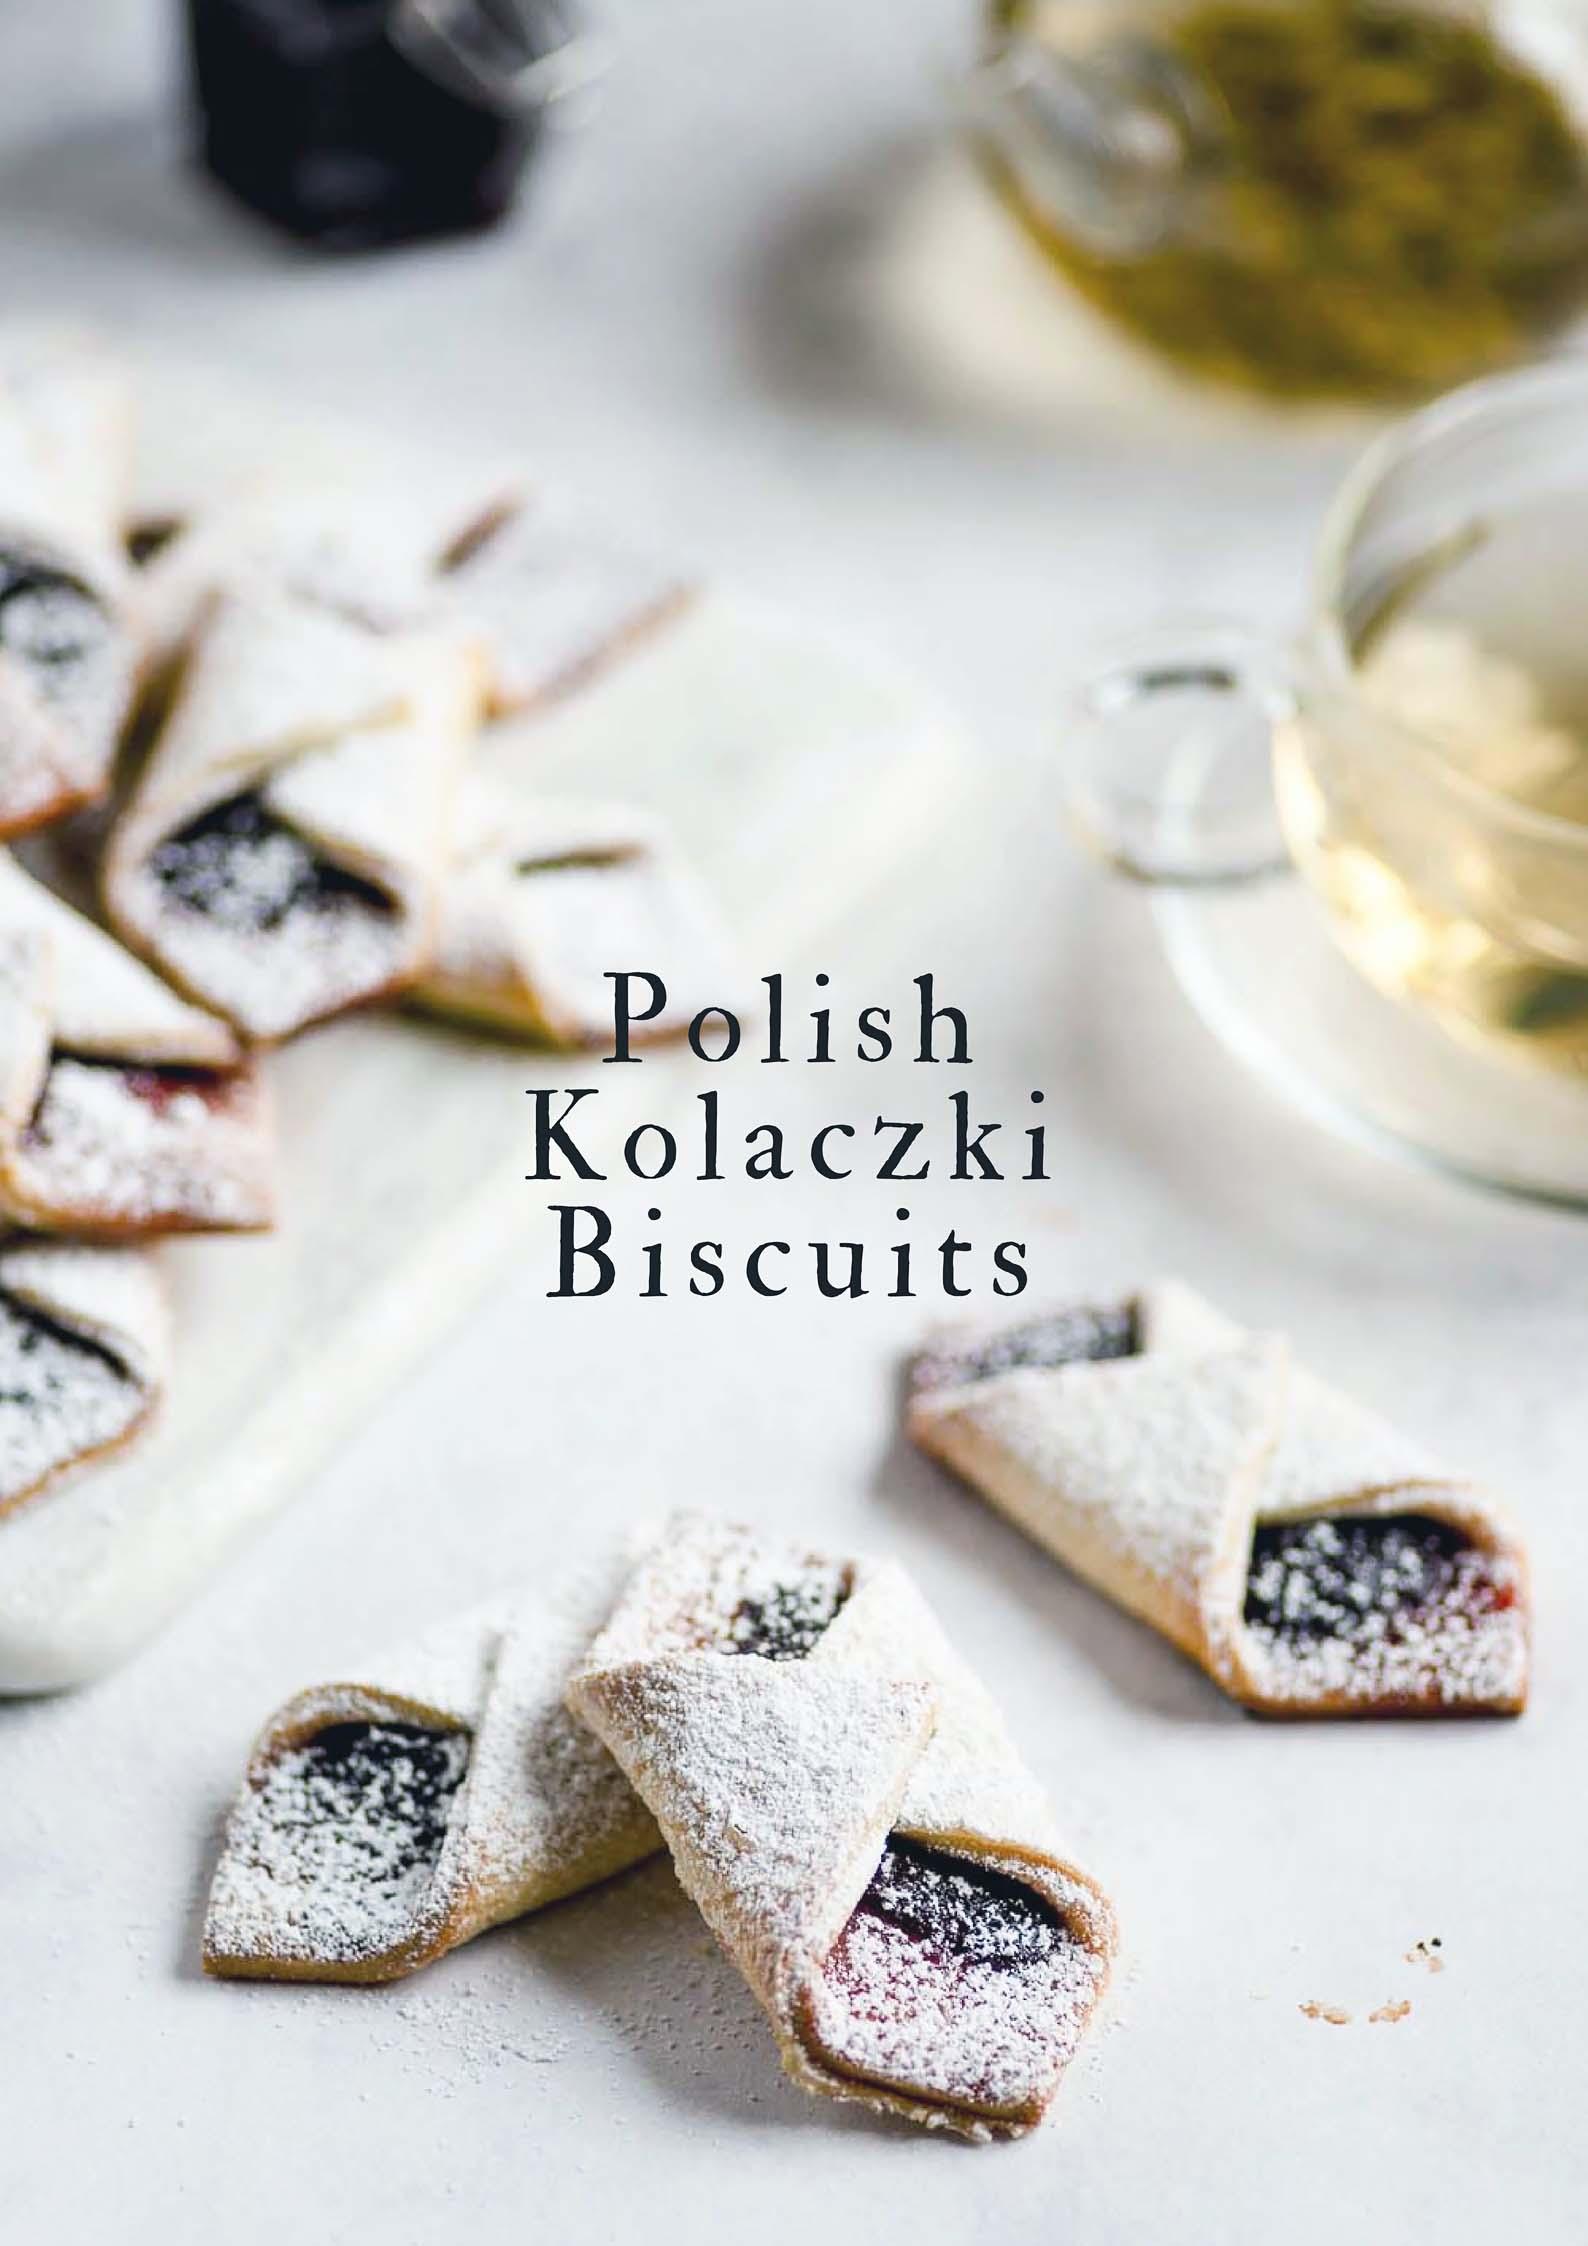 Kolaczki Biscuits - Polish Christmas Cream Cheese Biscuits with Jam